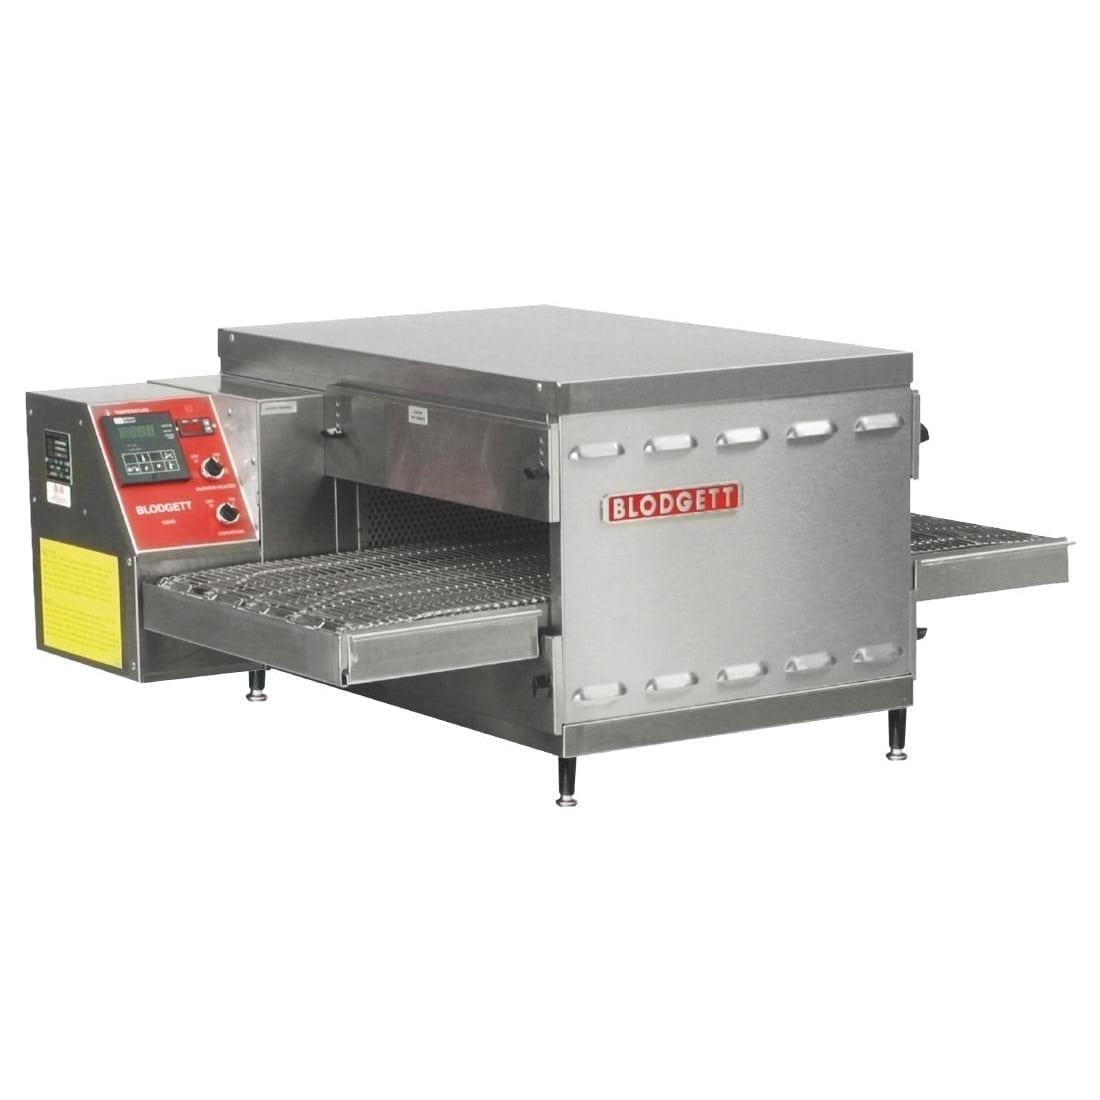 Blodgett Conveyor Oven - Natural Gas (Direct)-0